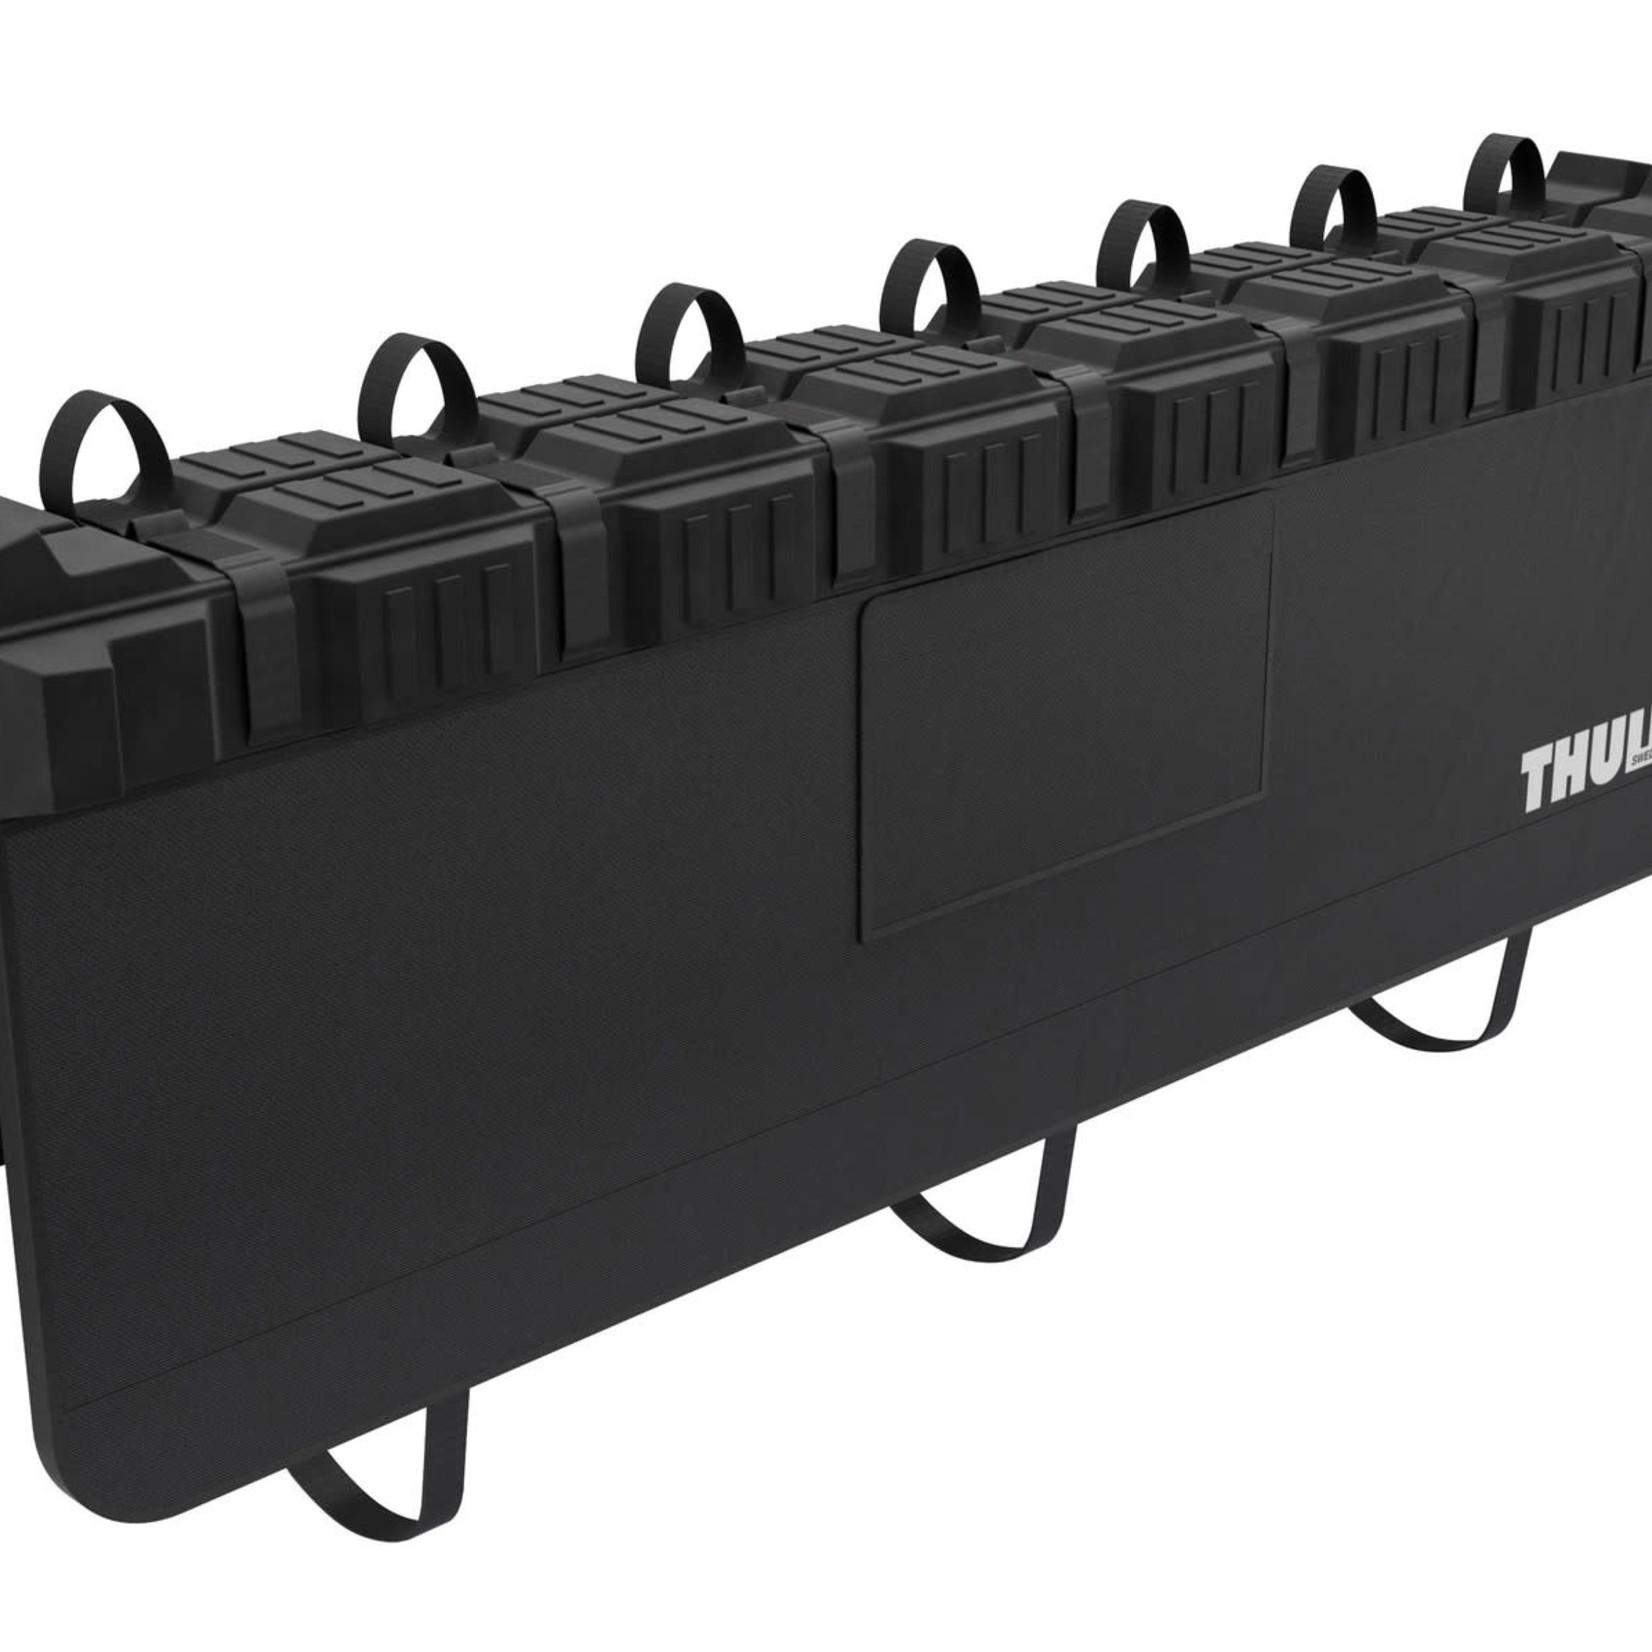 Thule Gate Mate Pro Compact Black/Silver